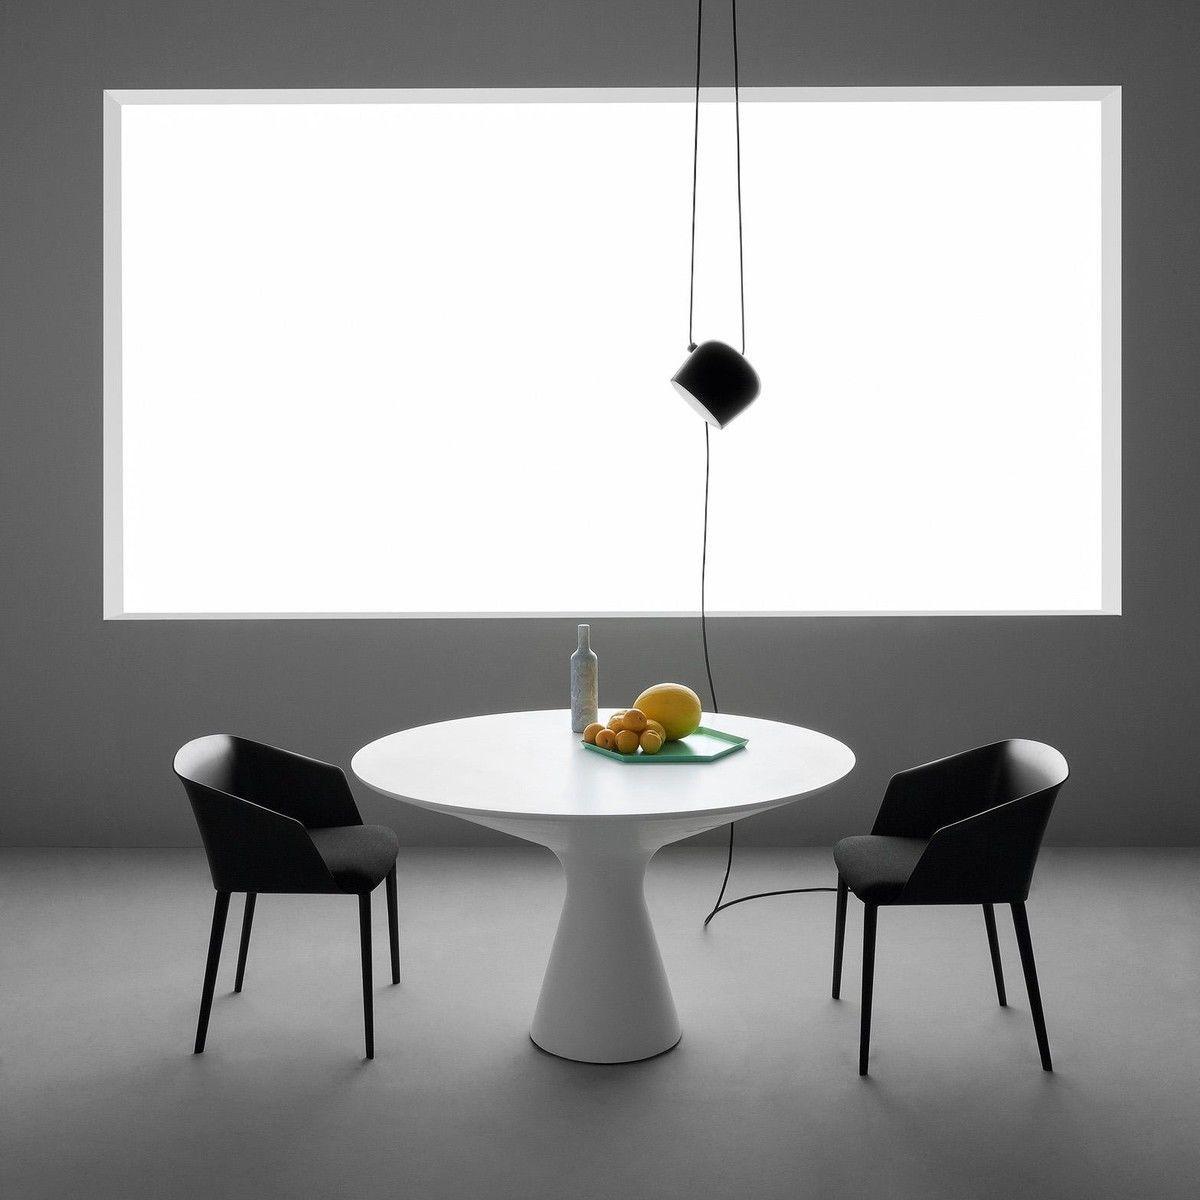 Aim LED Suspension Lamp with plug  Flos  AmbienteDirect.com